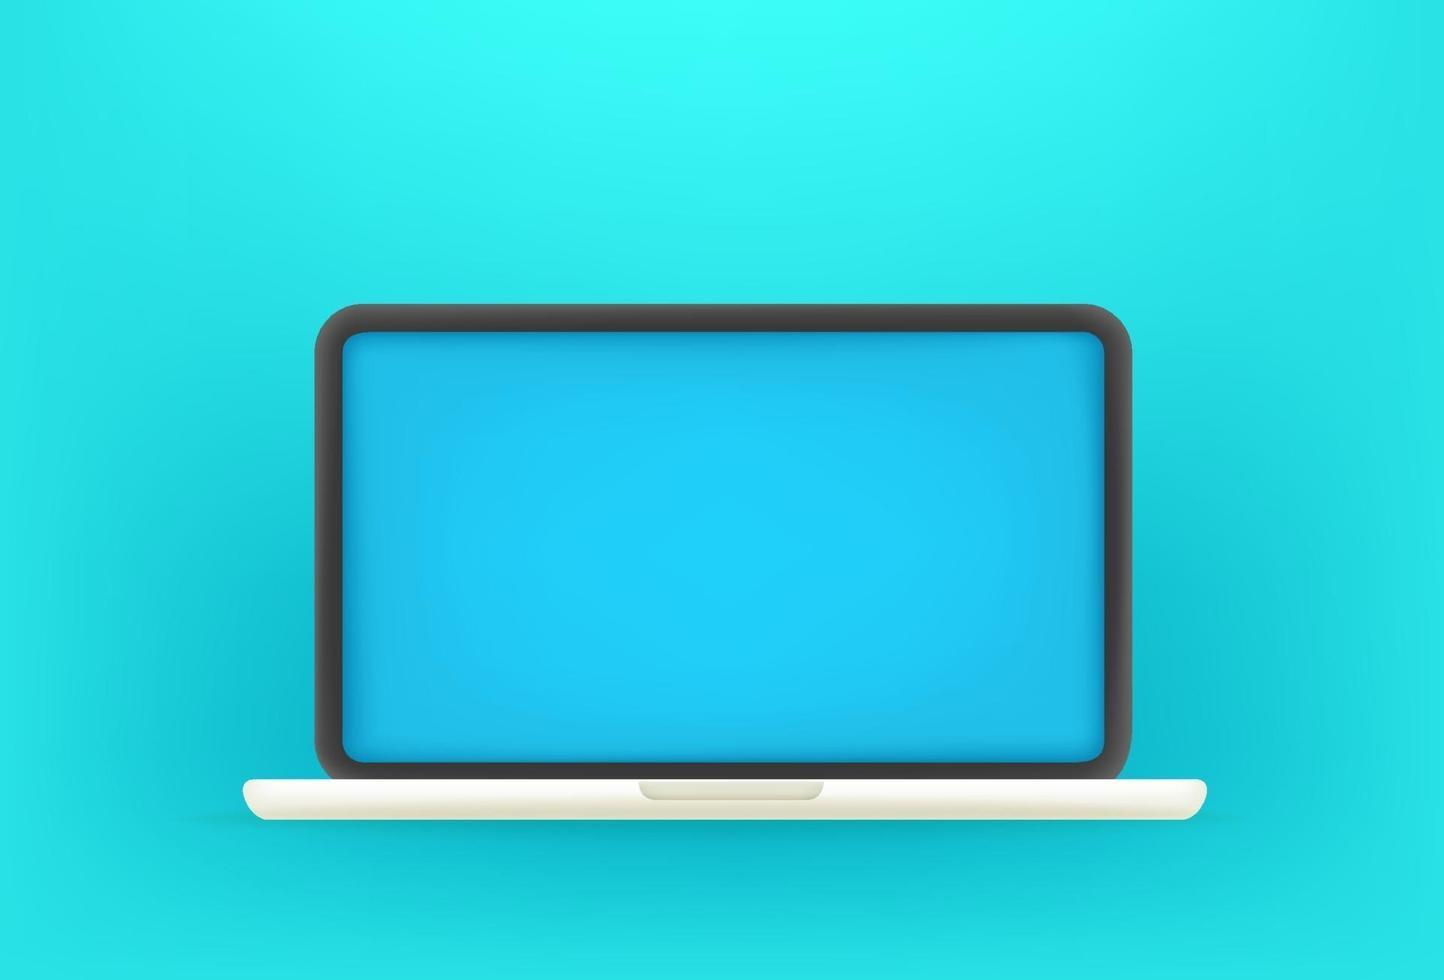 moderner Laptop mit blauem Bildschirm. Niedliche Vektorillustration des 3D-Stils vektor